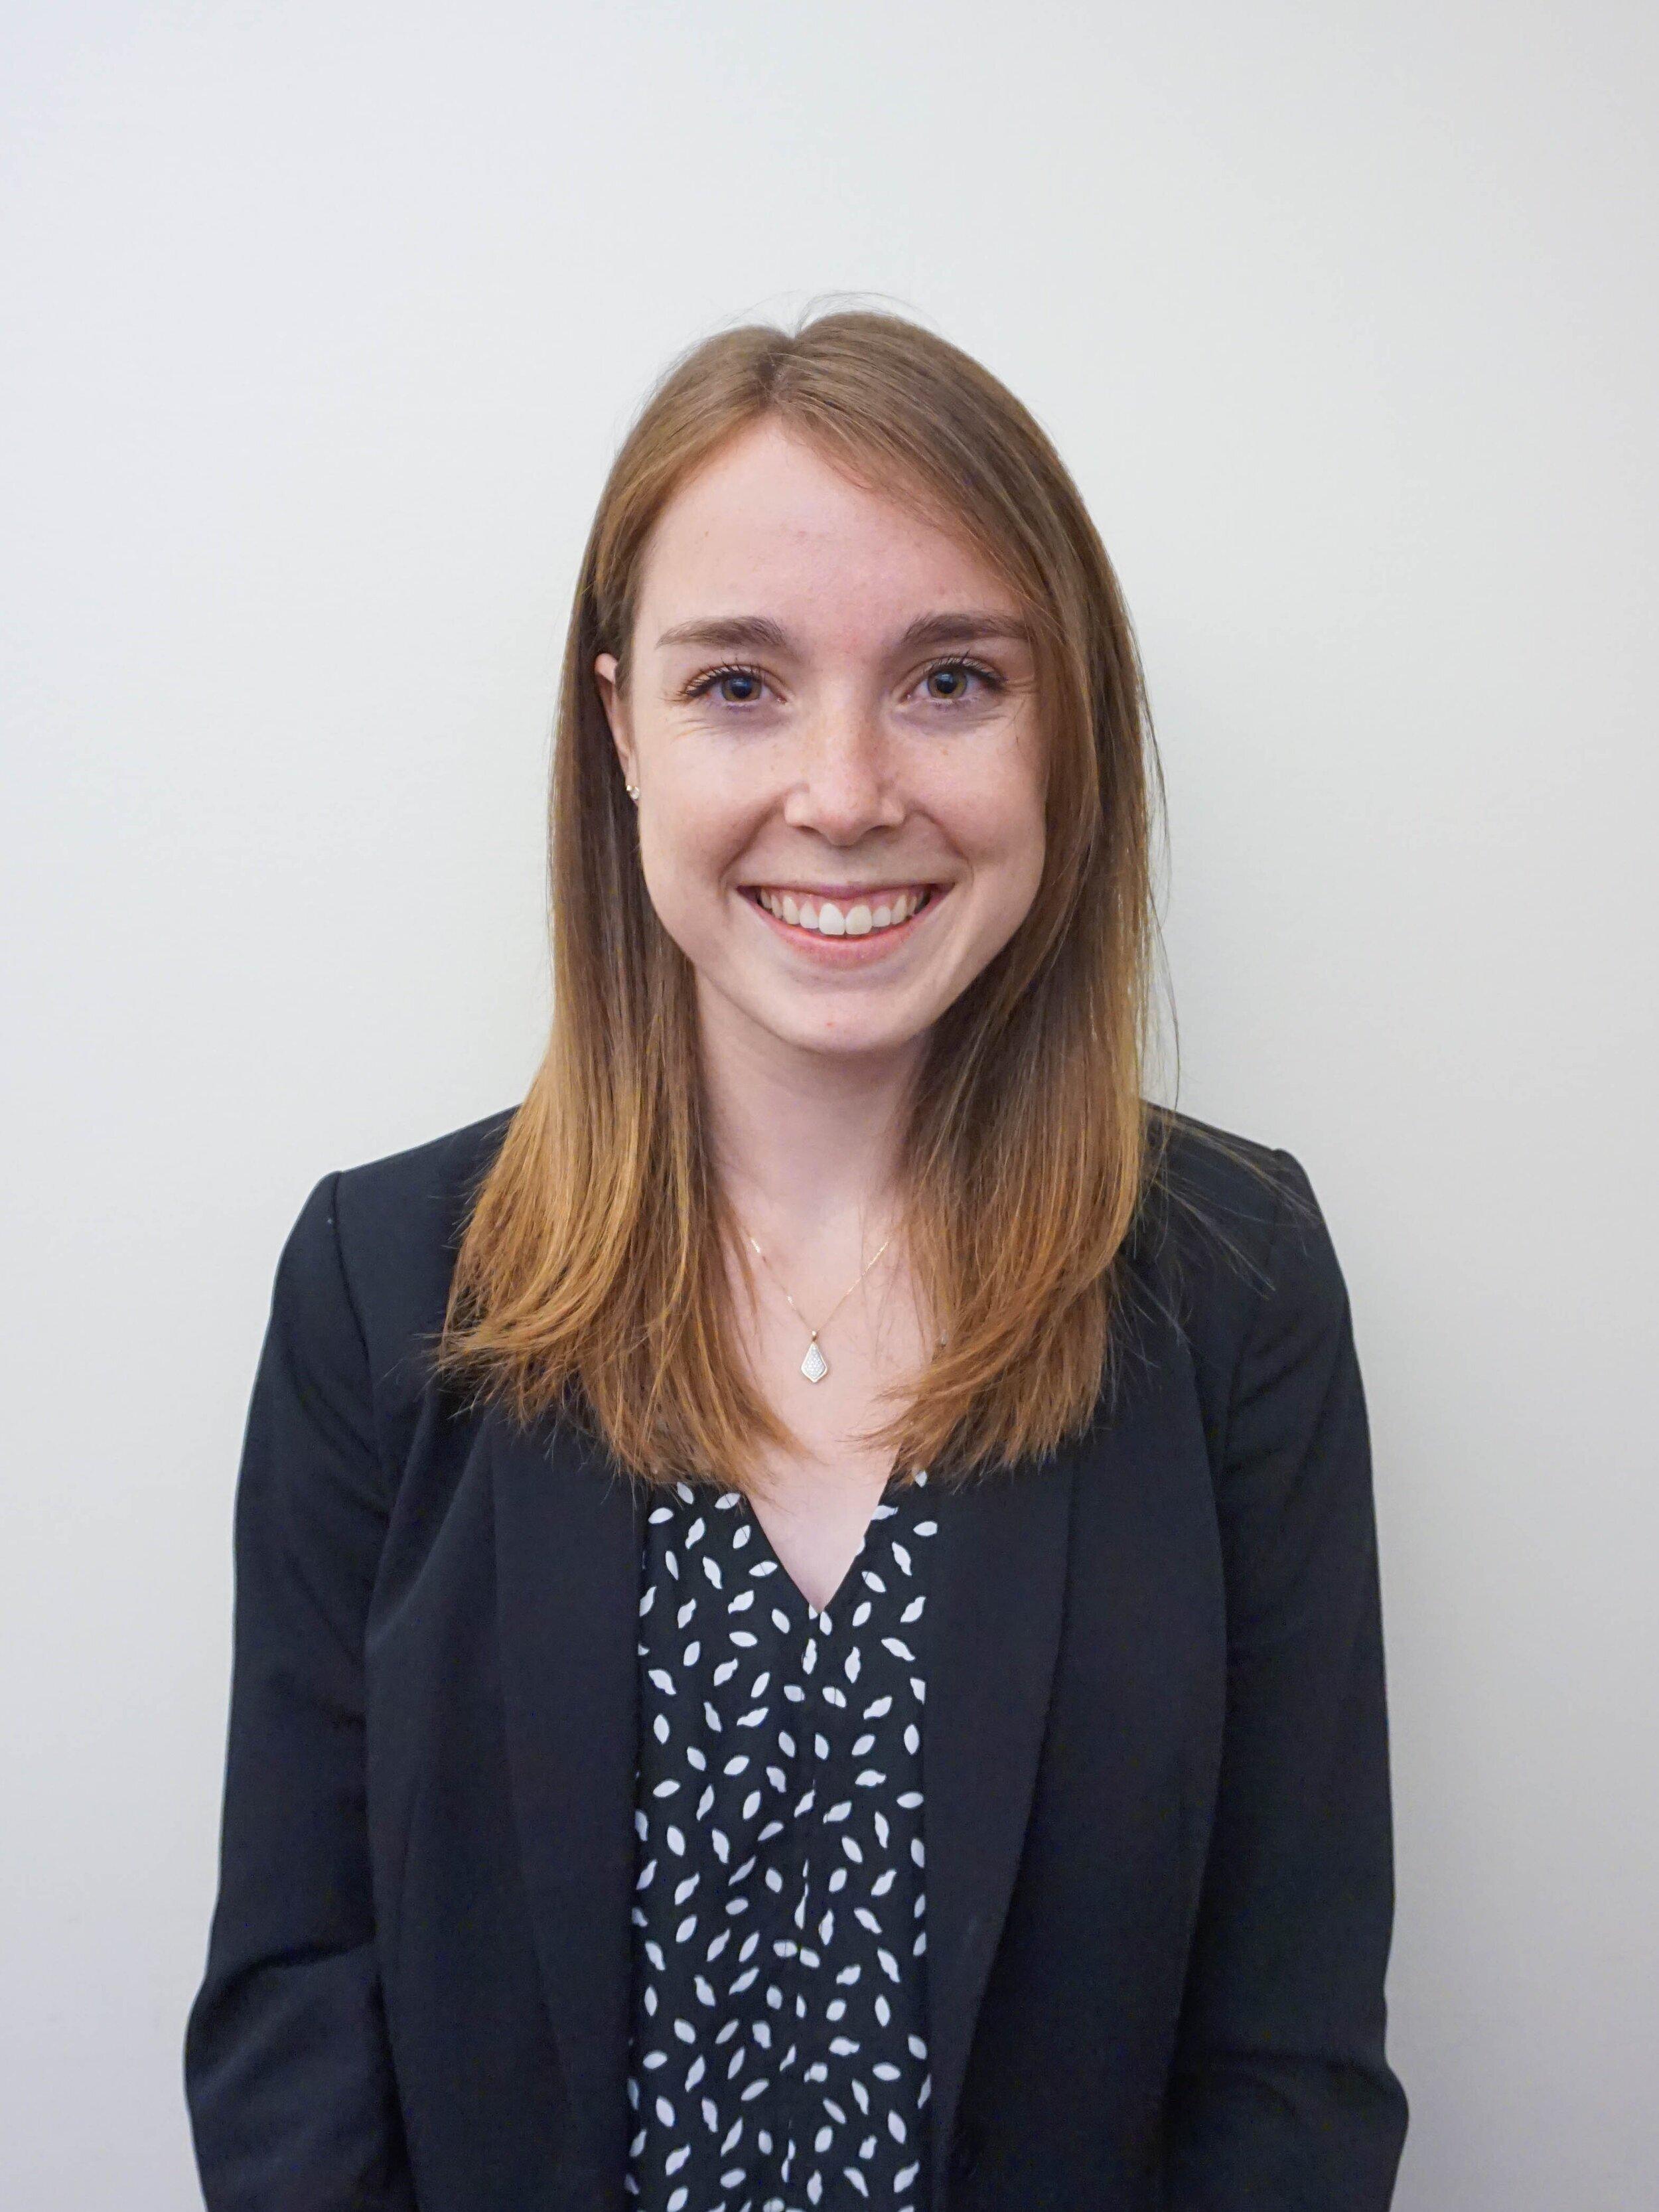 VP Community Service - Ashley Anderson